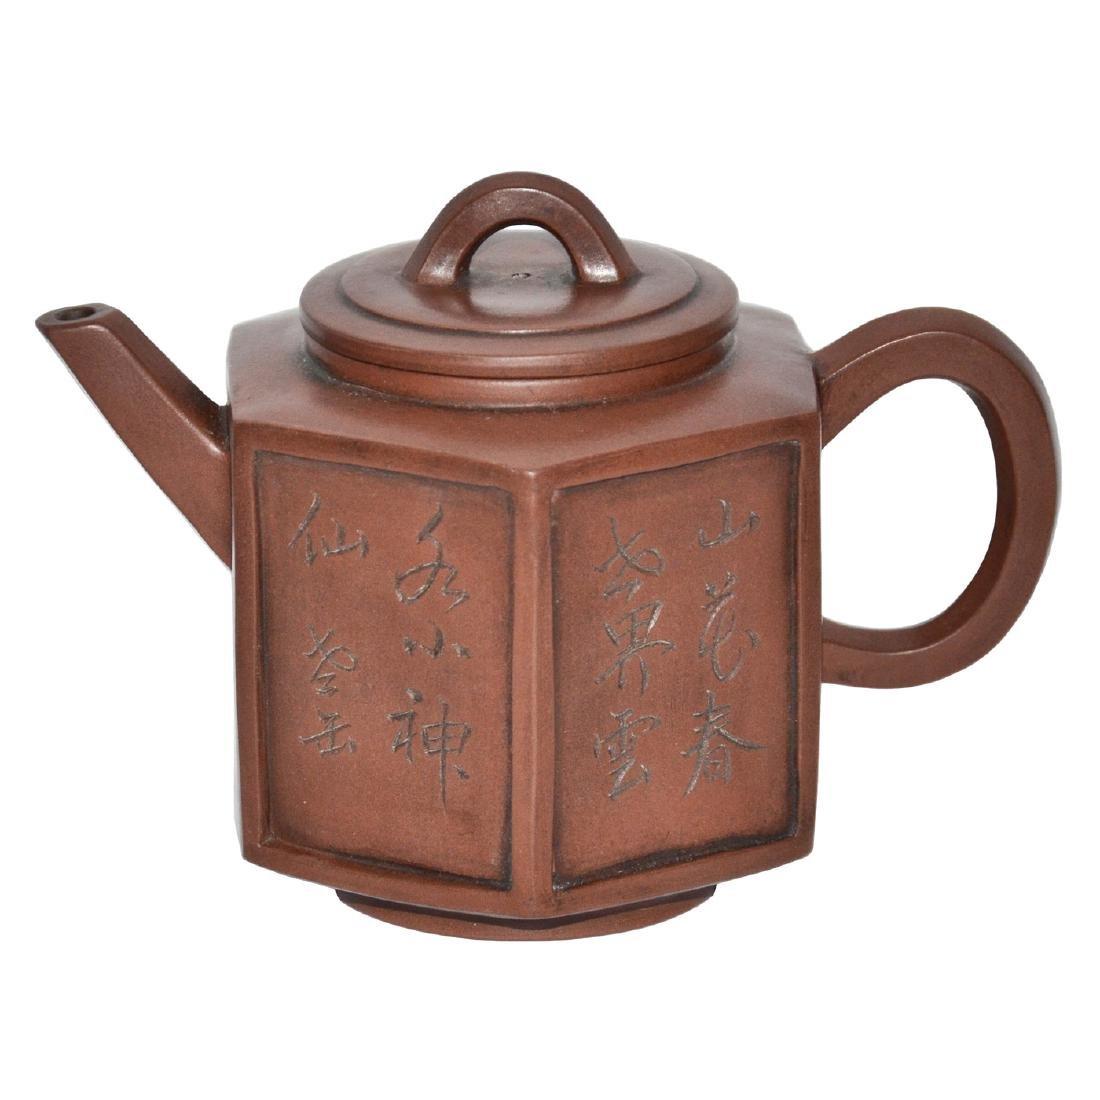 Gu Jingzhou, Hexagonal Zisha Teapot with Poem